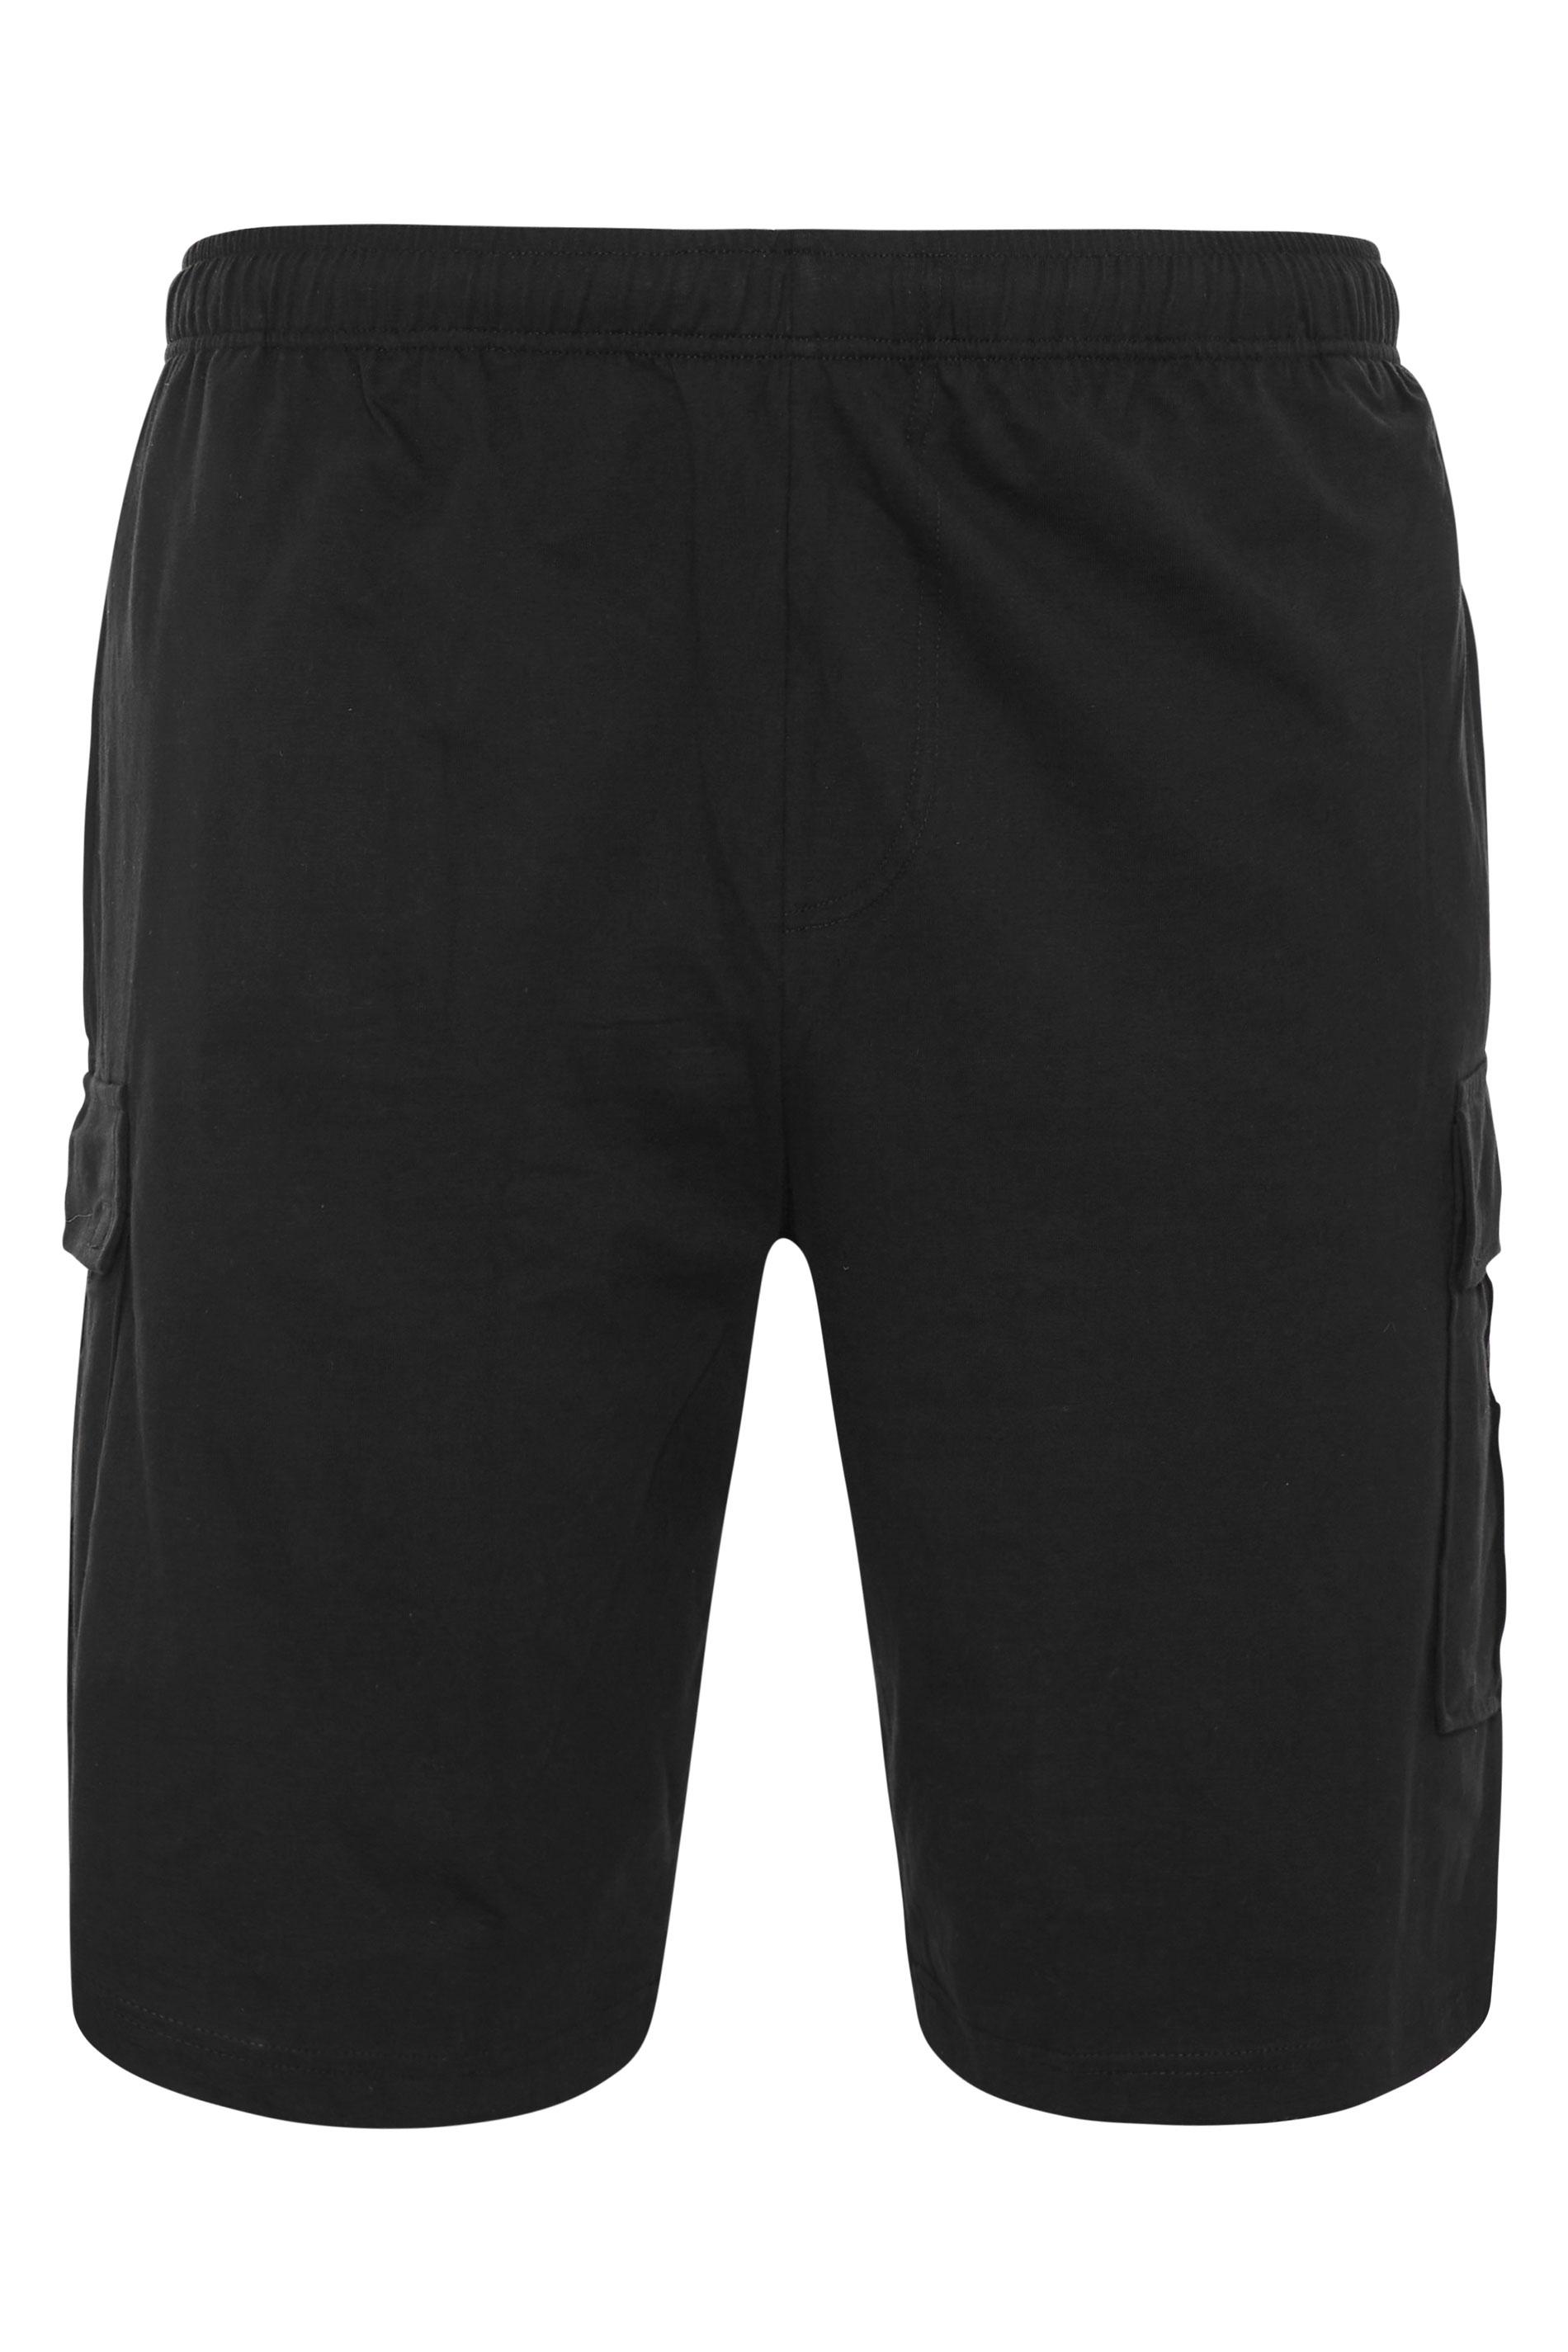 ESPIONAGE Black Cargo Jersey Short